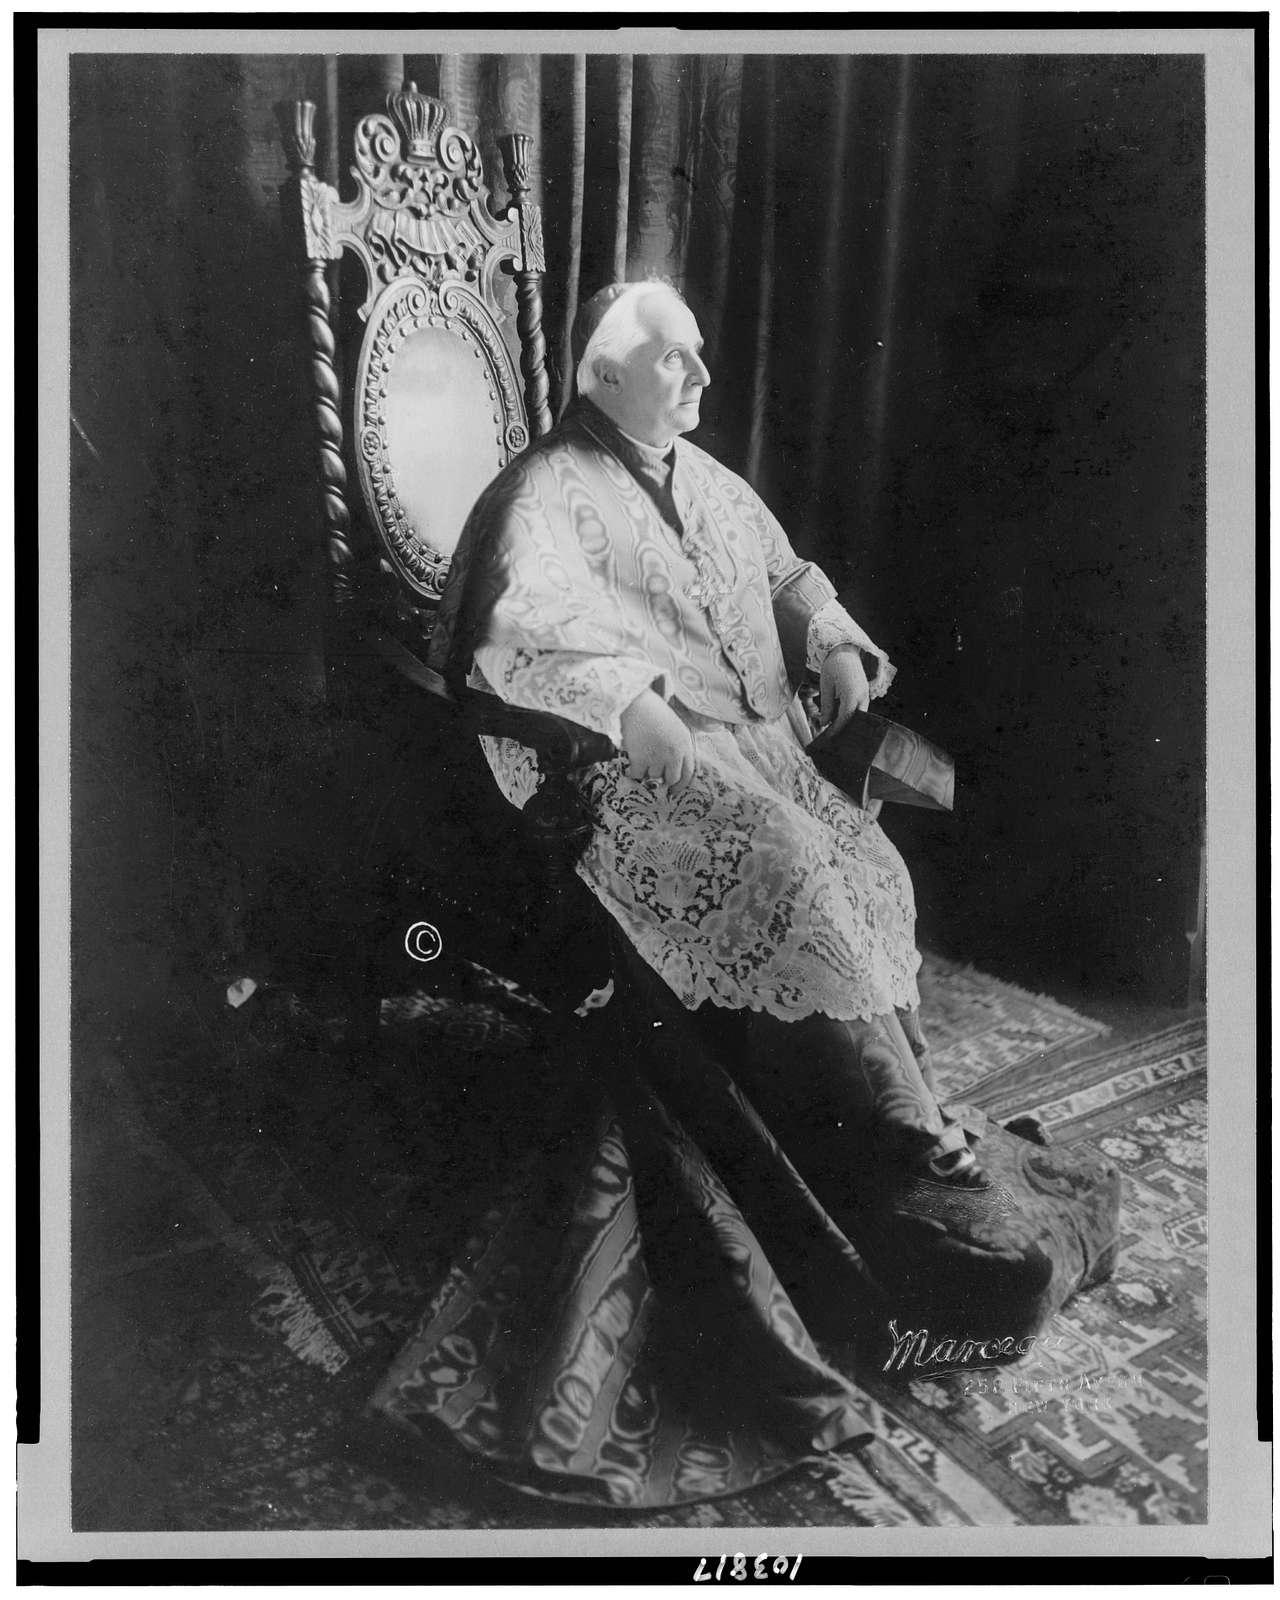 [Cardinal John Murphy Farley, full-length portrait, seated, facing right] / Marceau, New York.